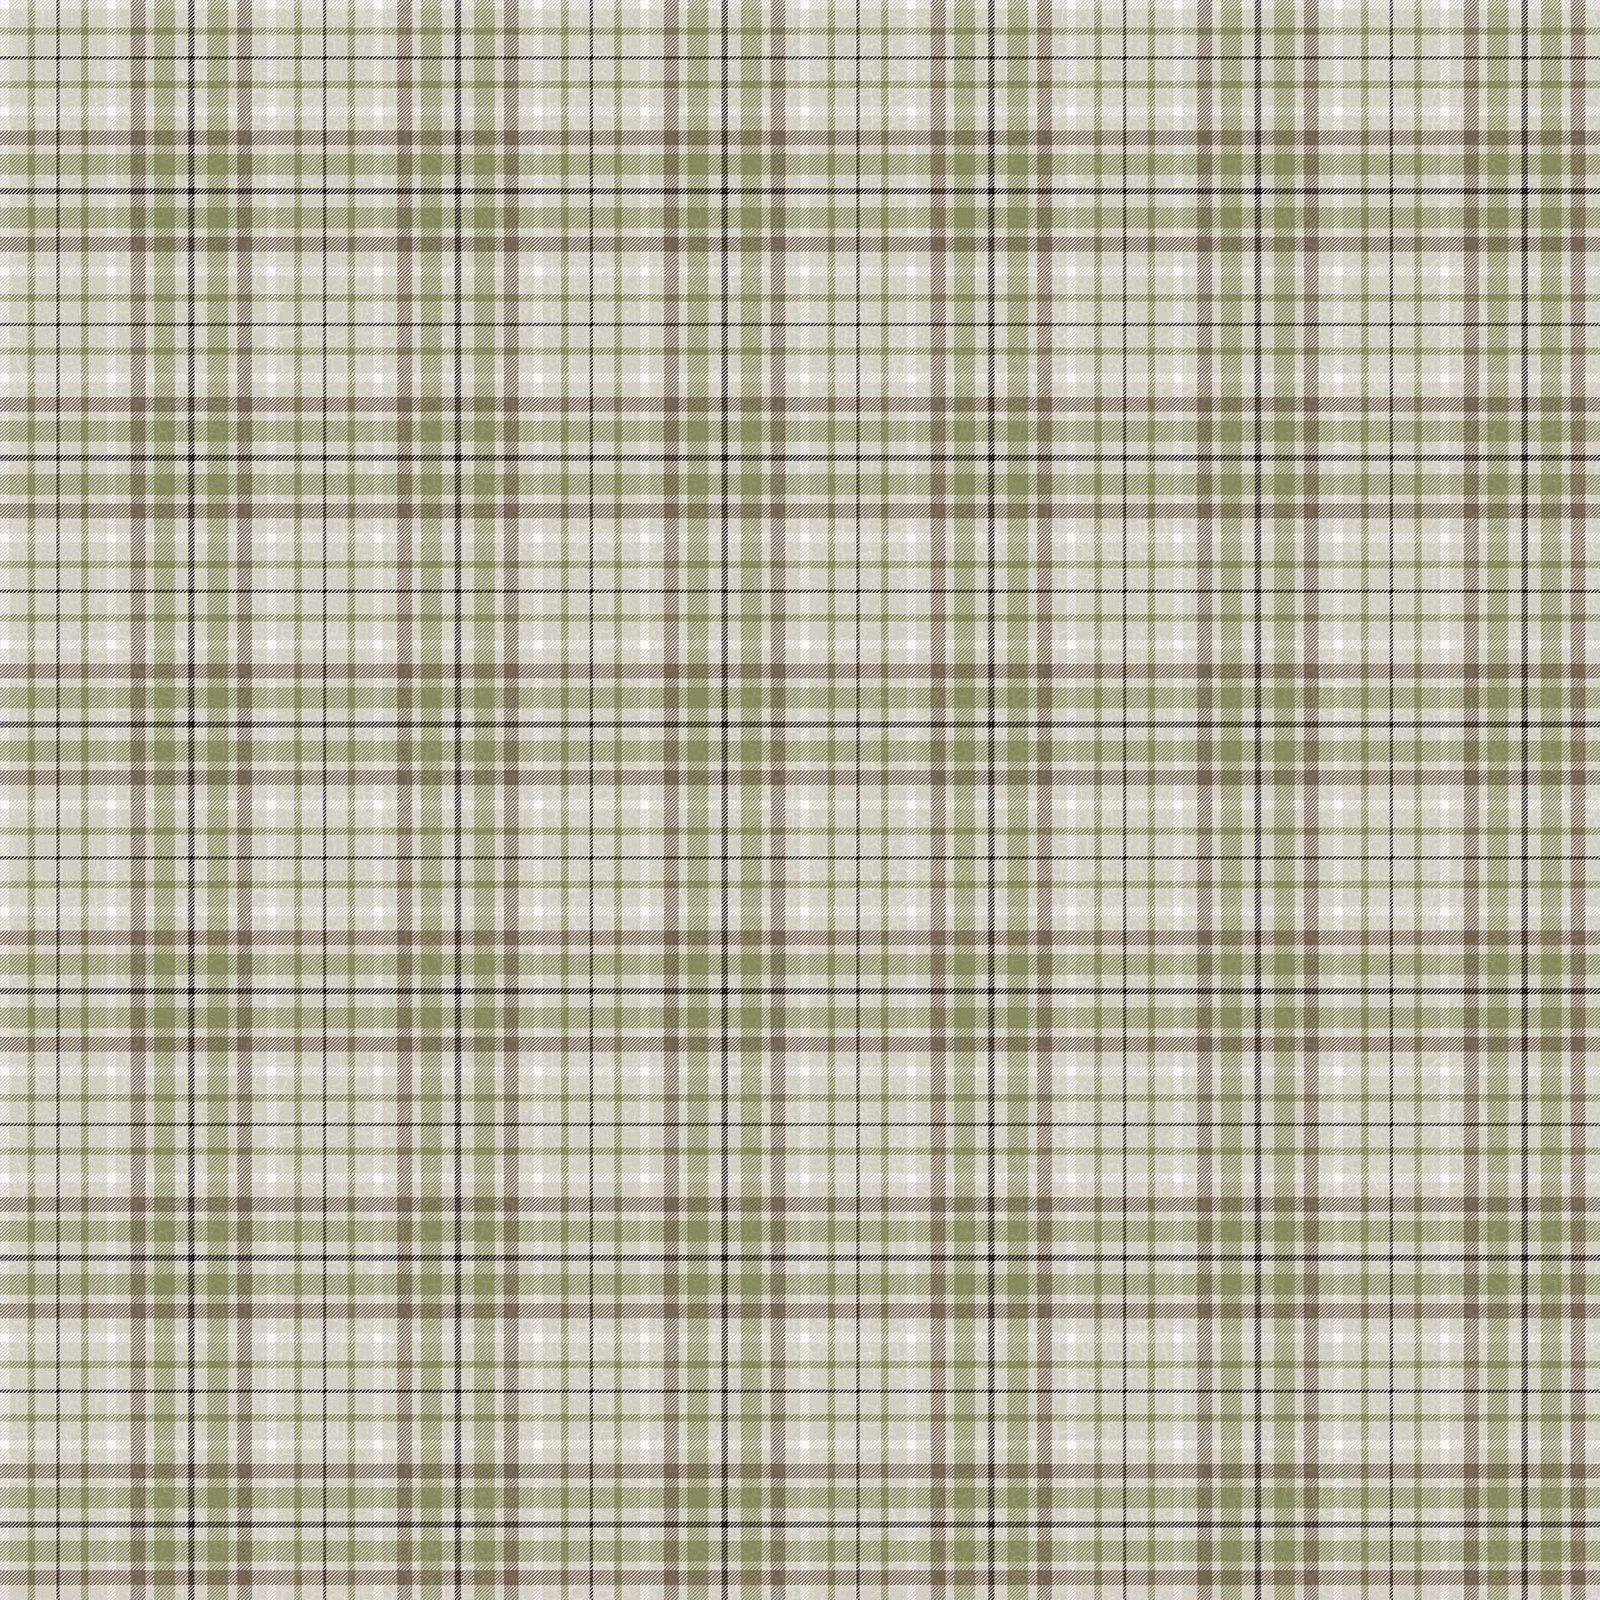 Lakeside Lodge Flannel F23559-92